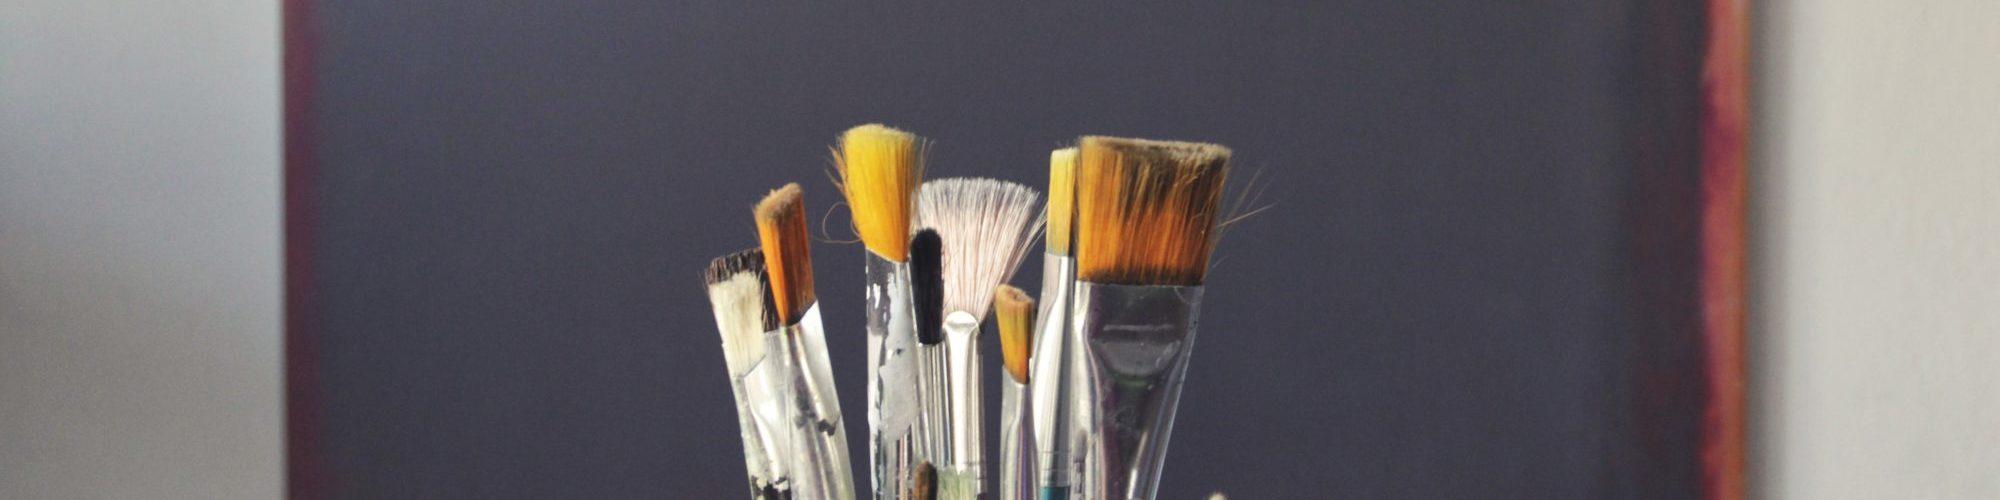 Pinsel für Acrylmalerei